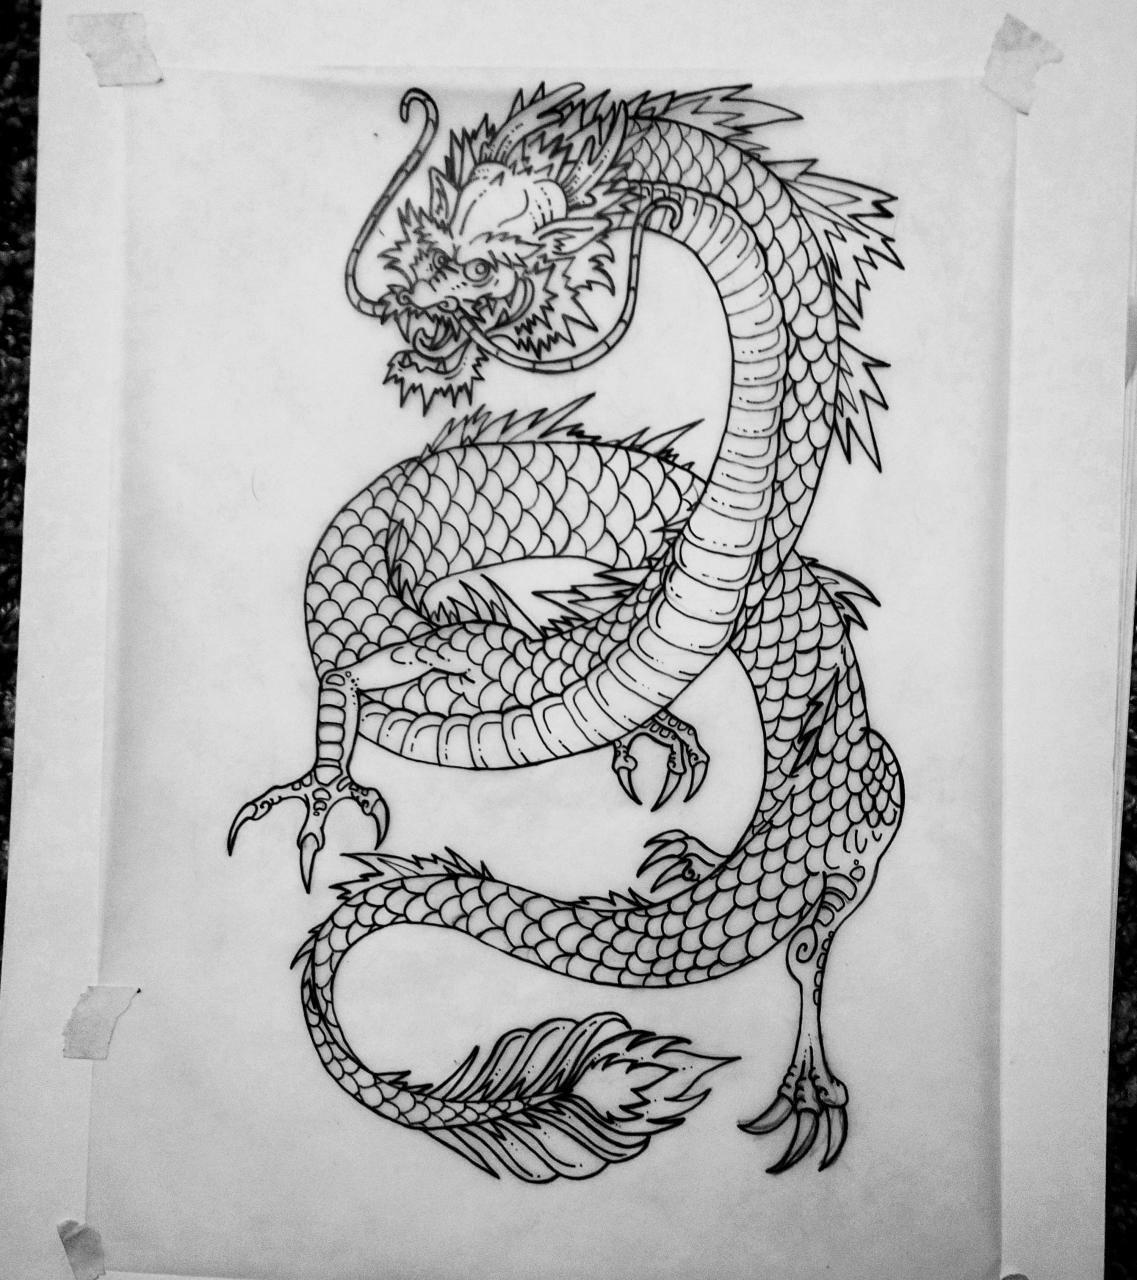 Aspiring tattoo artist. Building my portfolio. Any criticism welcome.